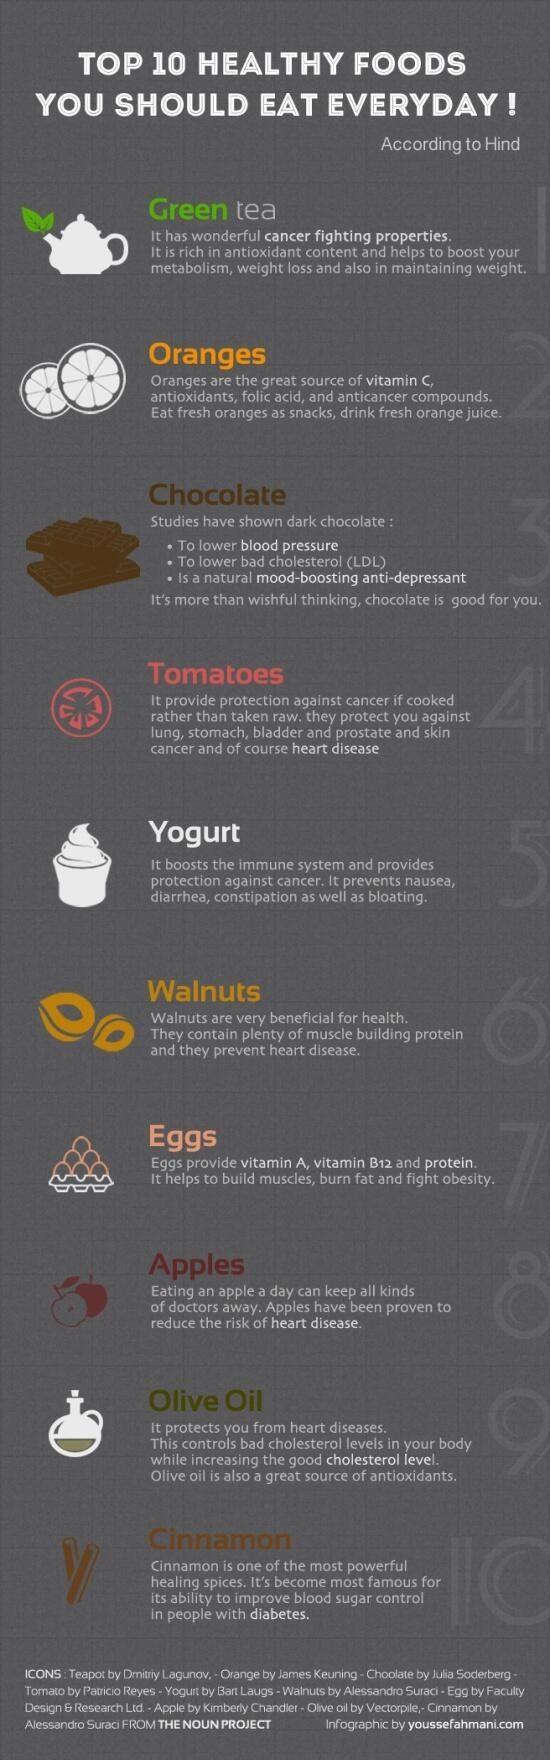 Fat Burning Foods For Abs http://freebonusdownload.net/fatburningfoods/